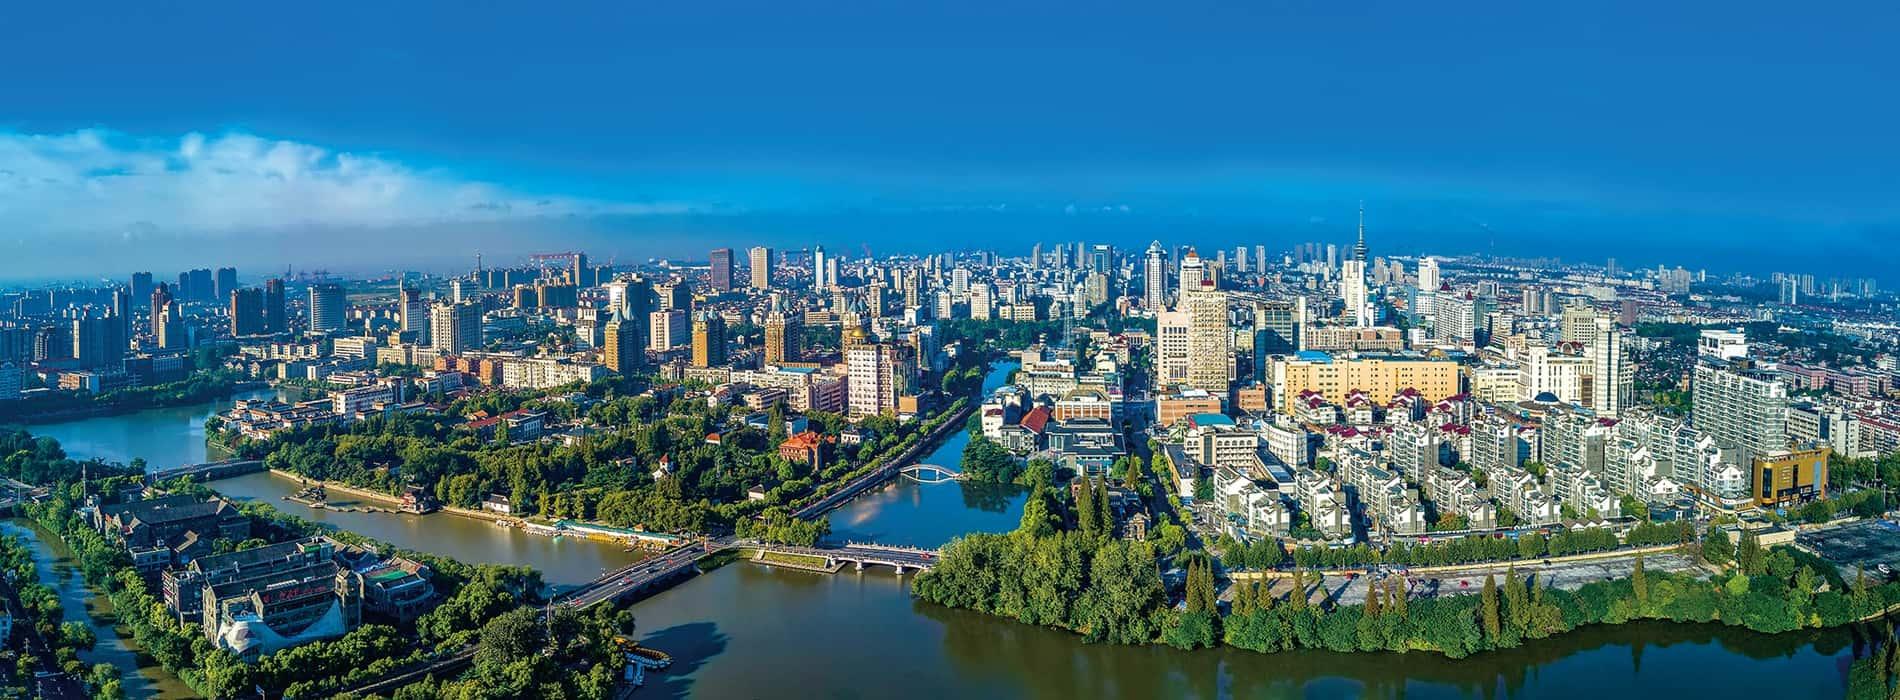 Nantong city aerial view